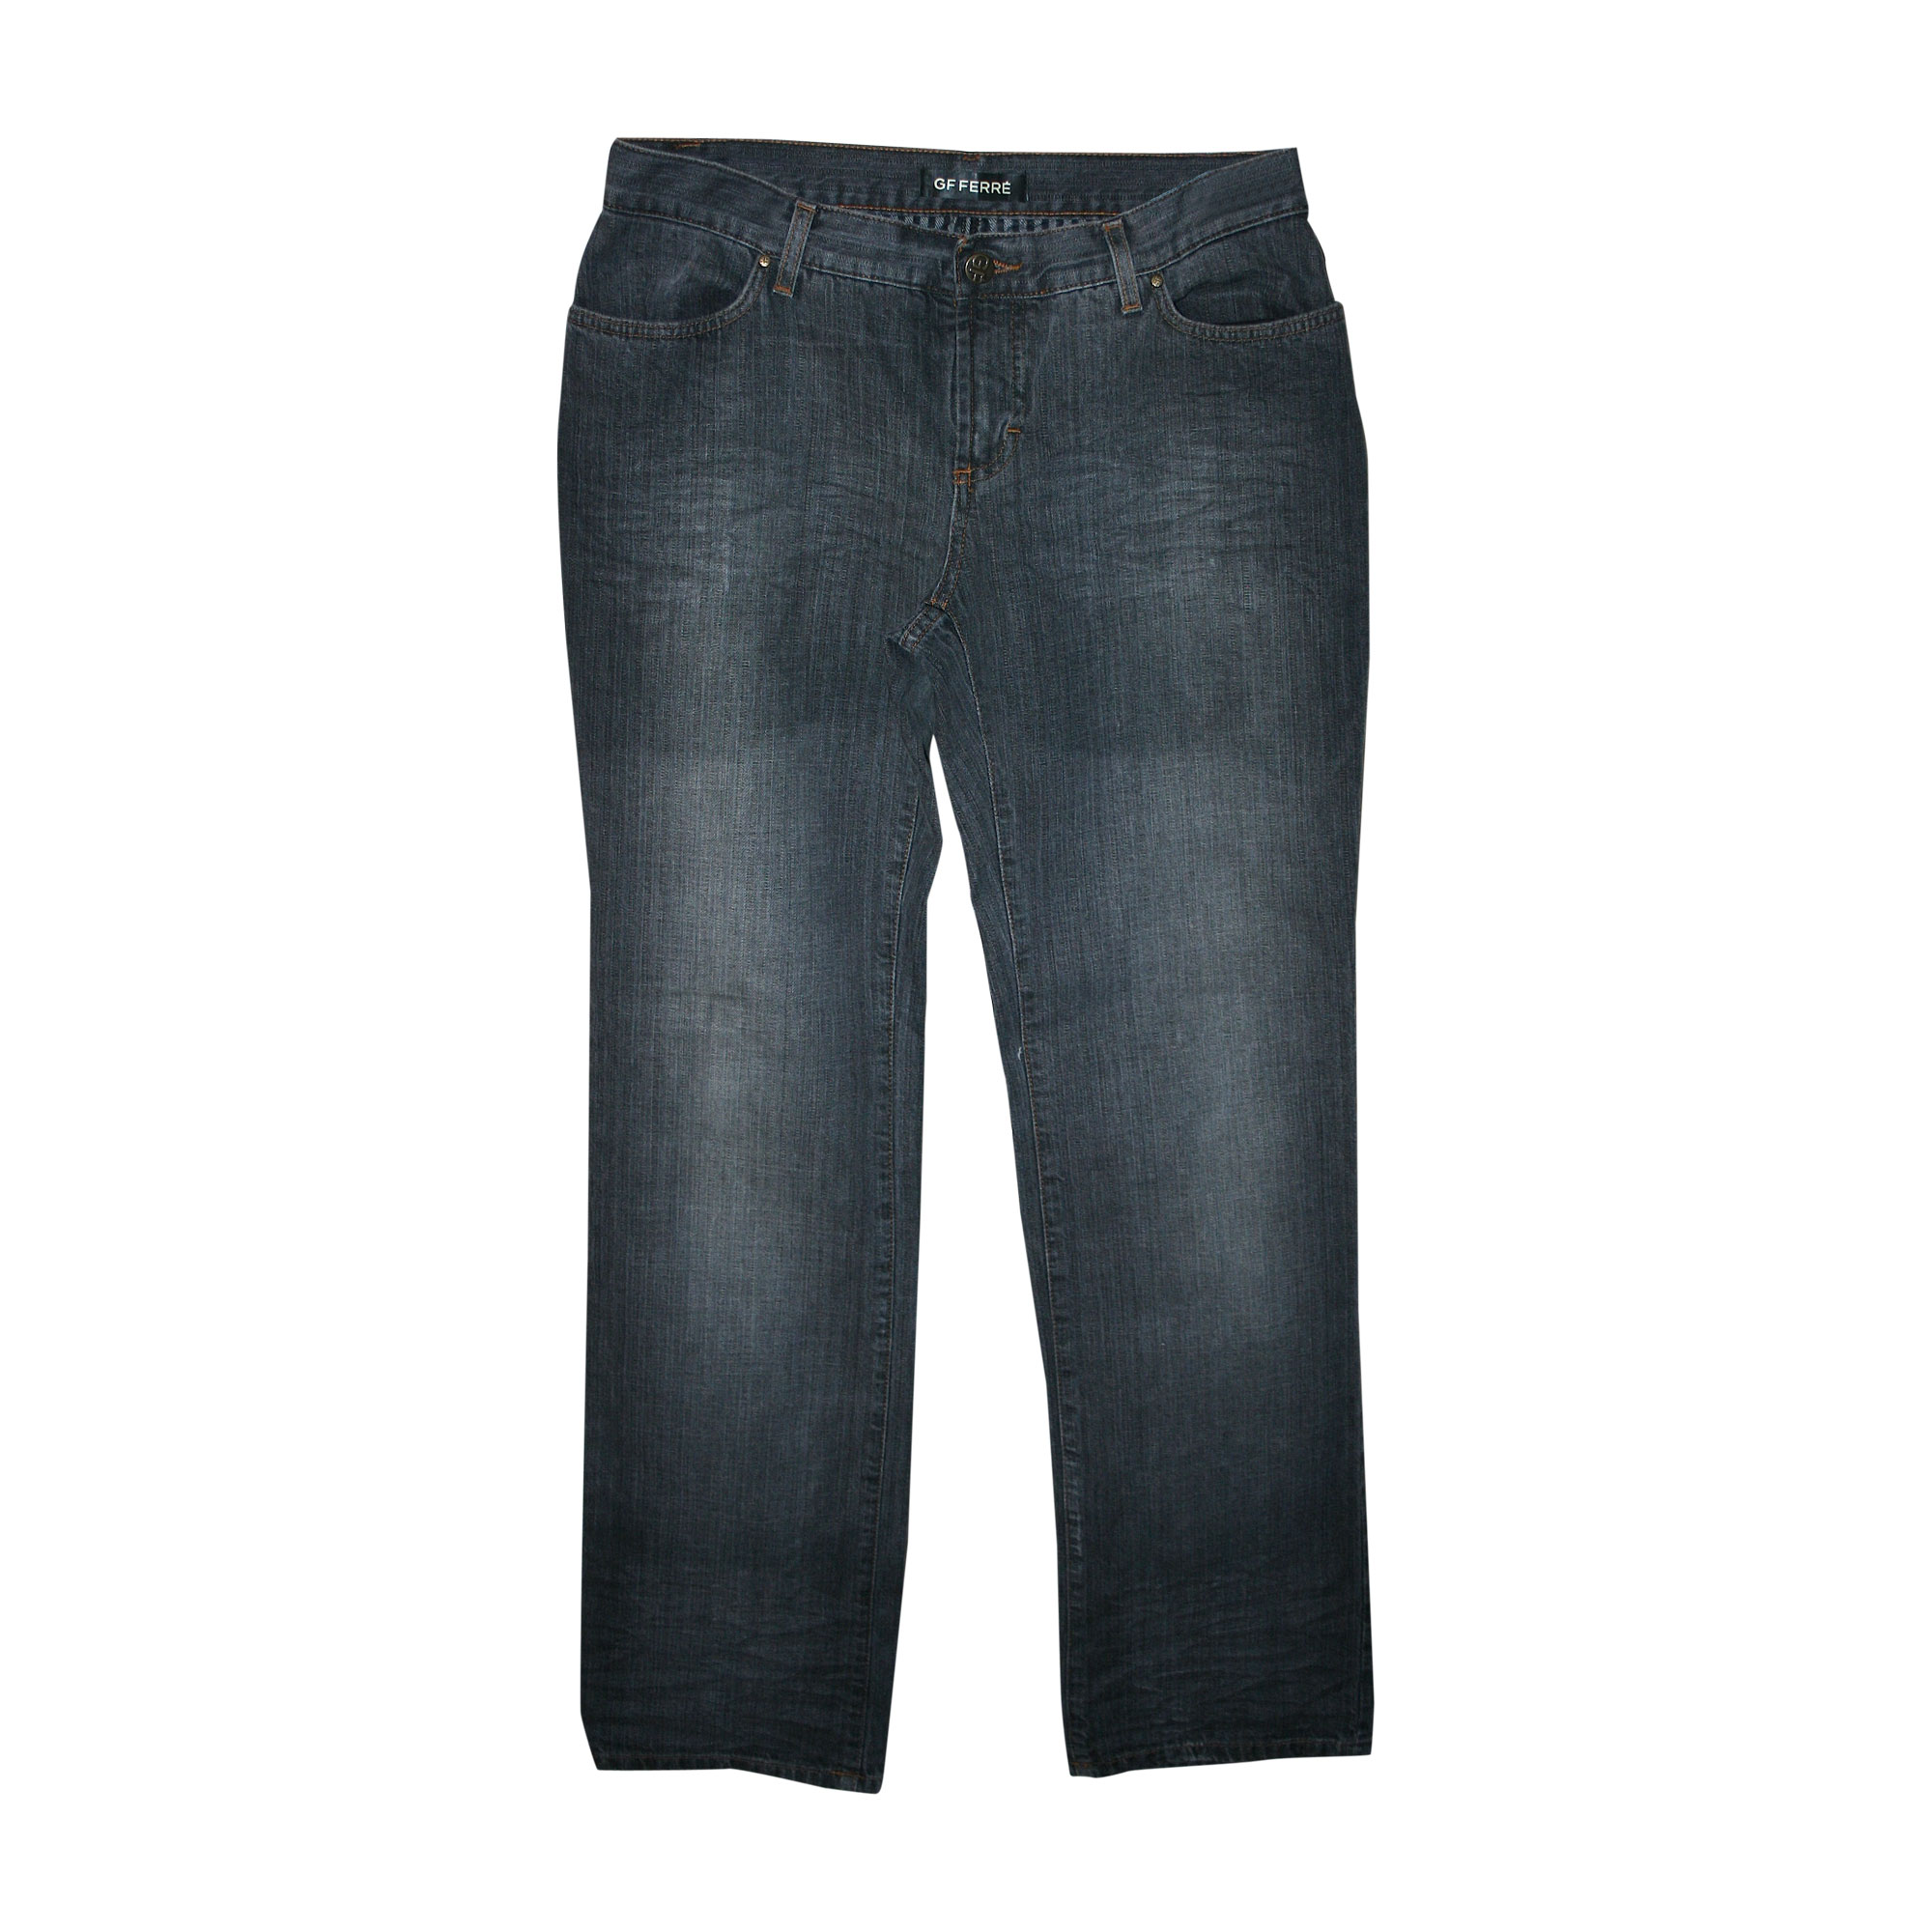 Jeans droit GIANFRANCO FERRE Gris, anthracite